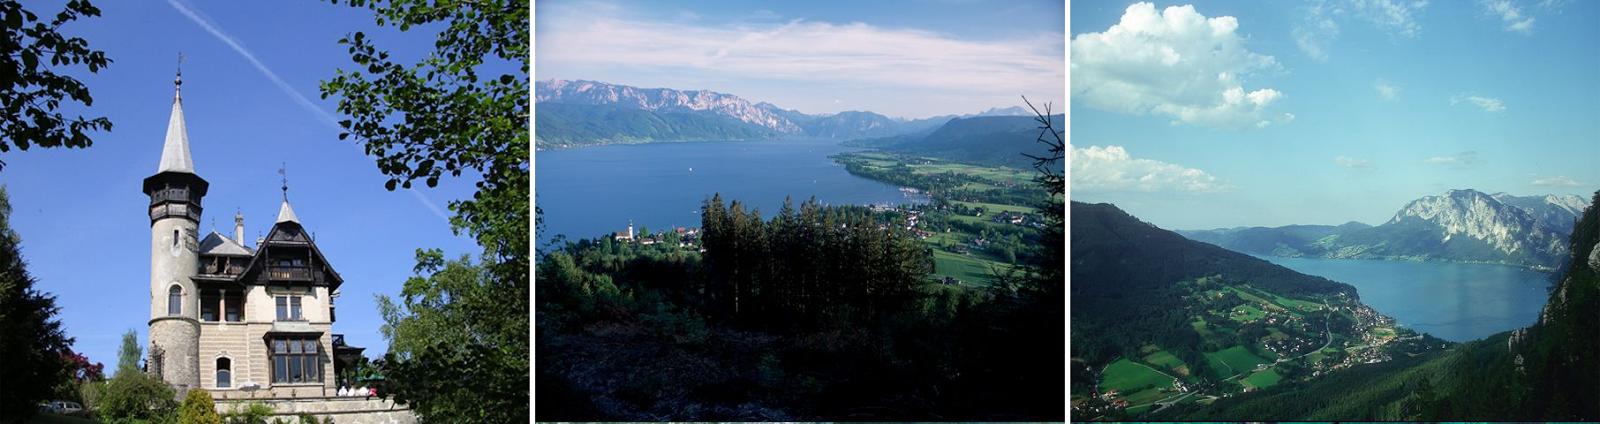 Villa Paulik, Ansichten Attersee